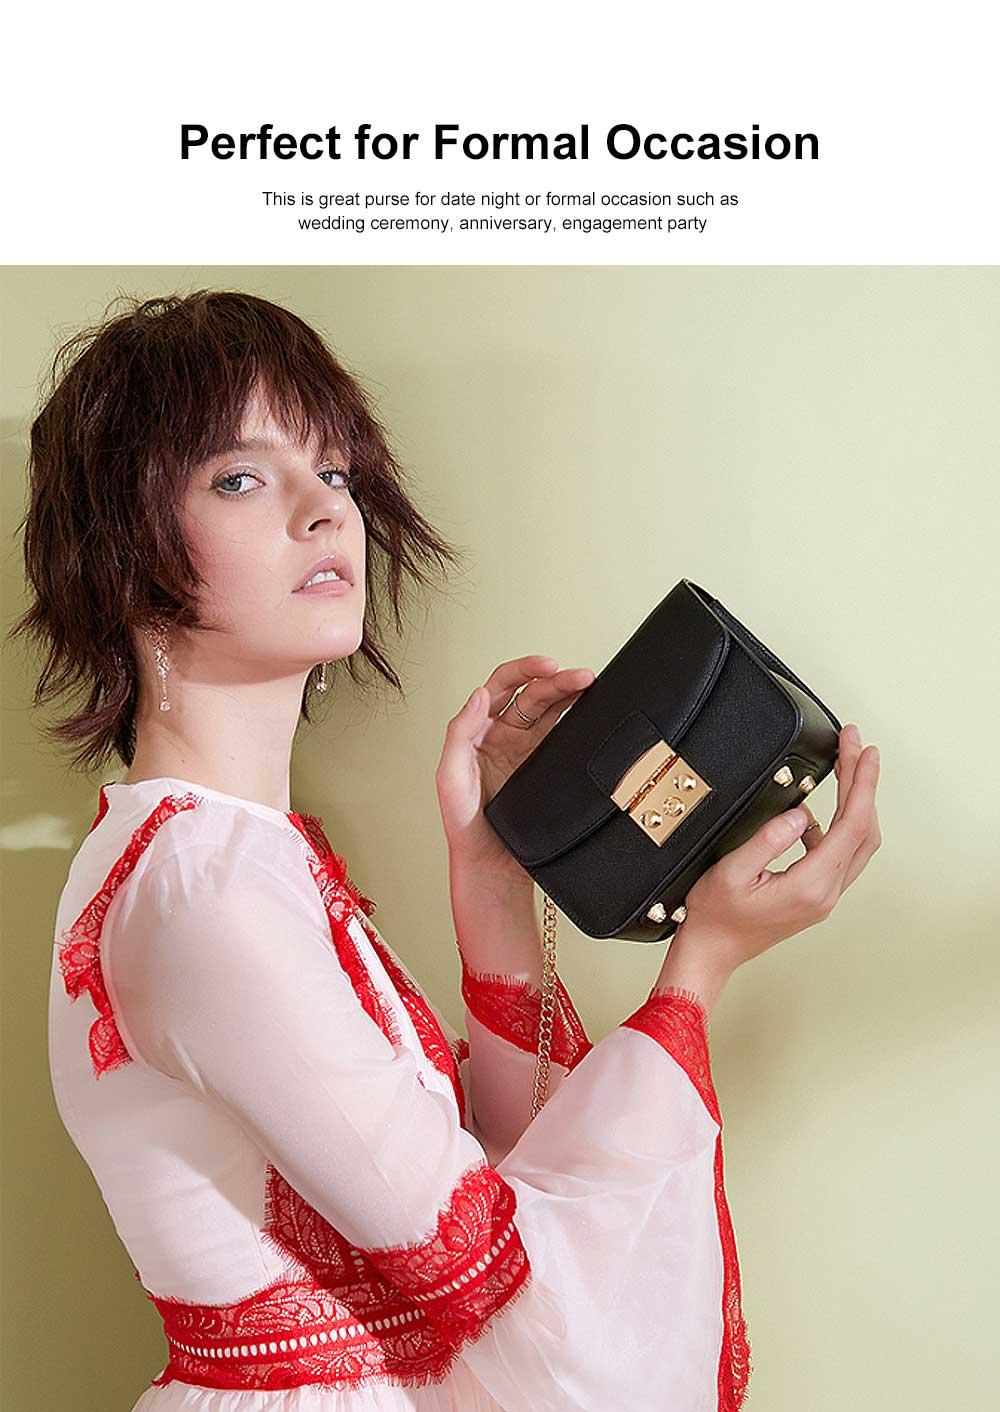 Female Small Cross-shoulder handbags for Women Cross-Body Bag Chain Shoulder Evening Clutch Purse Formal Bag 3